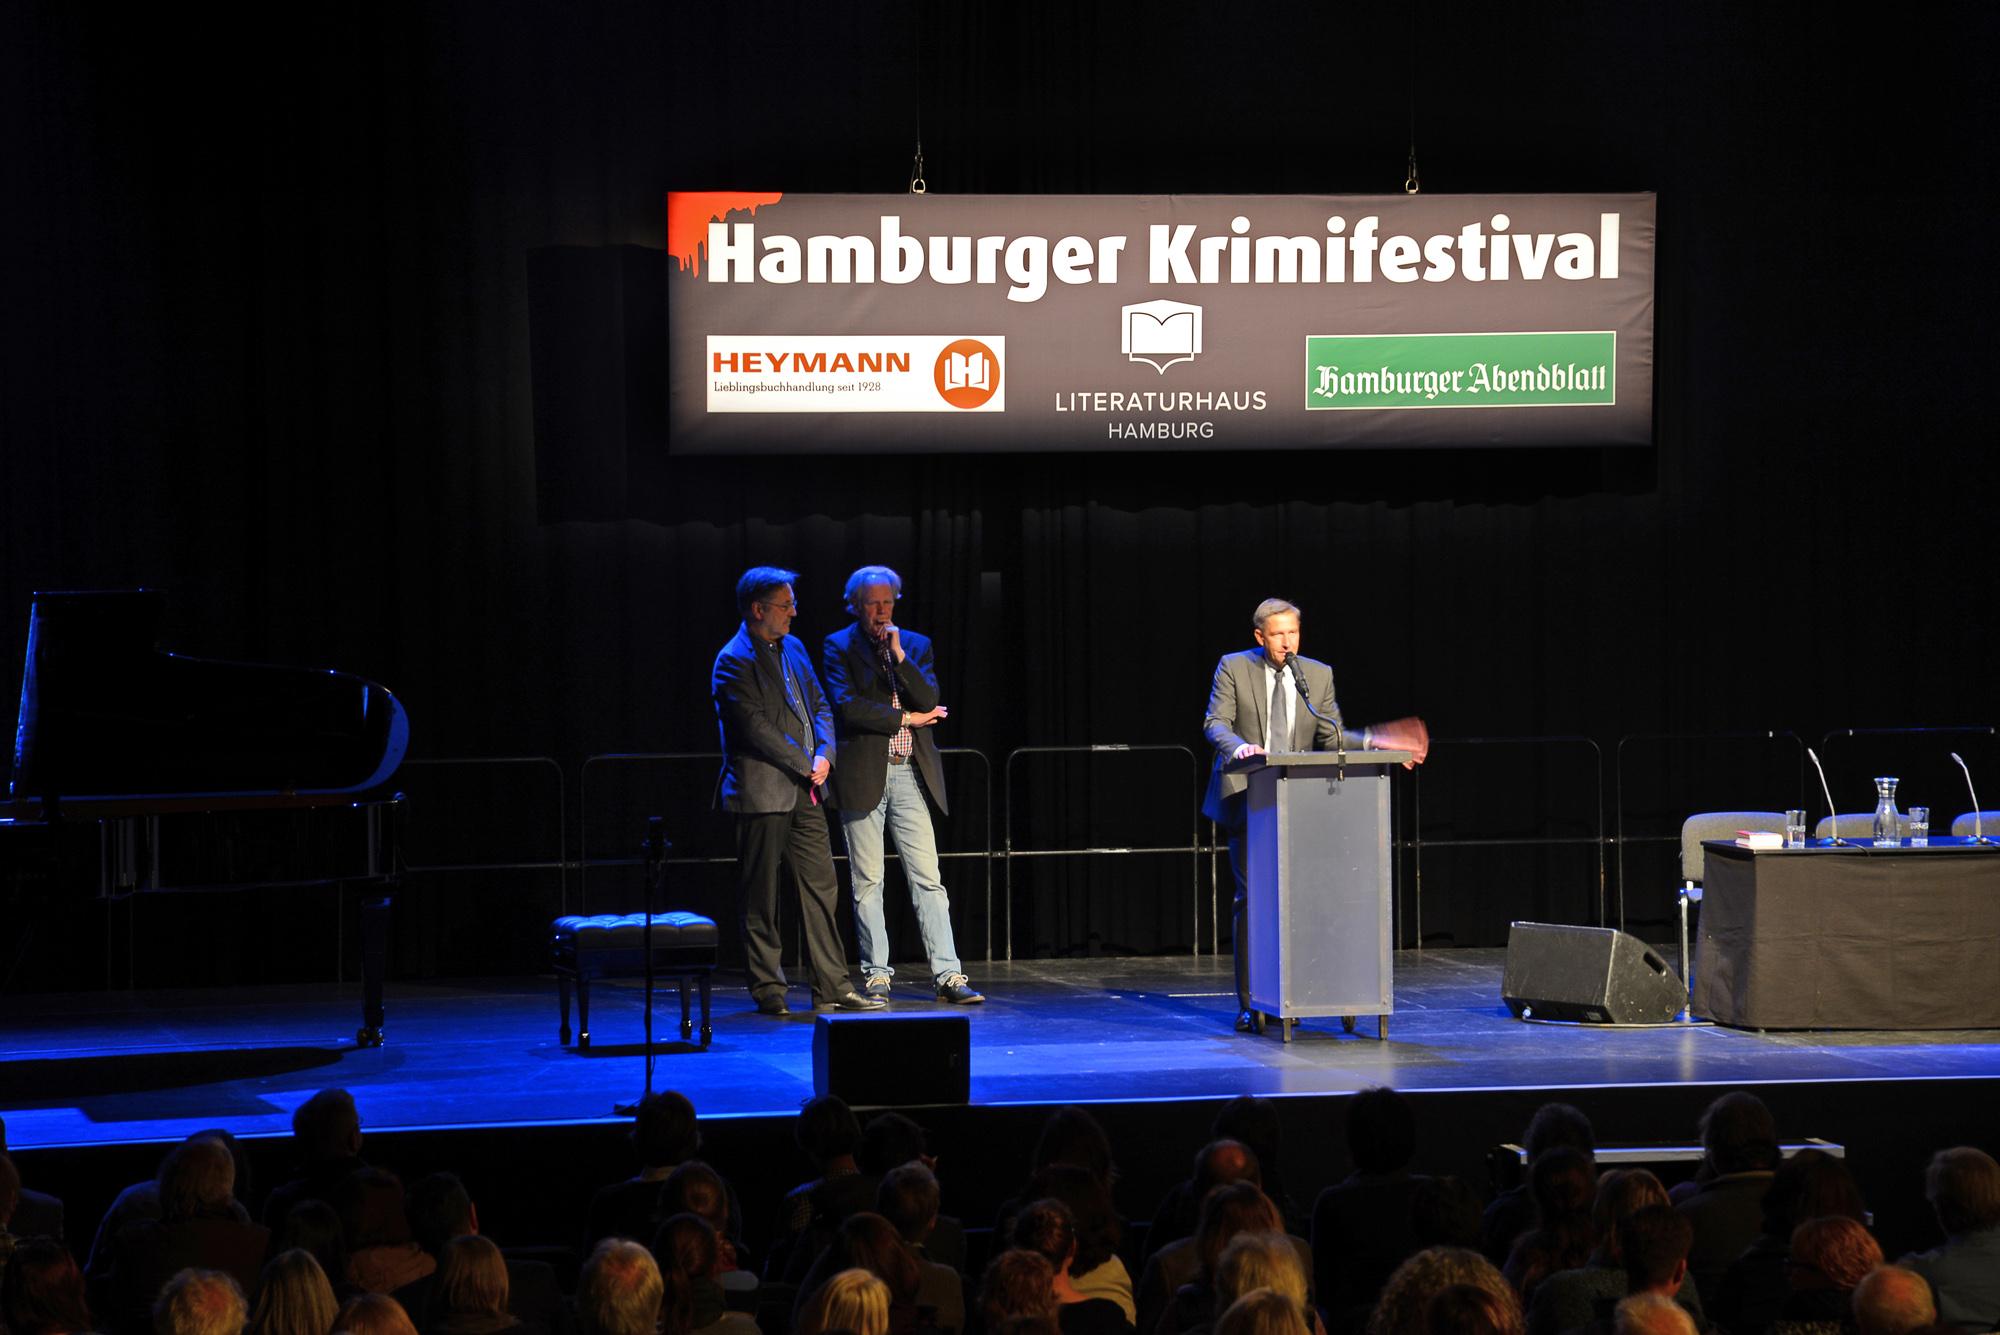 Hamburger Krimifestival 2015